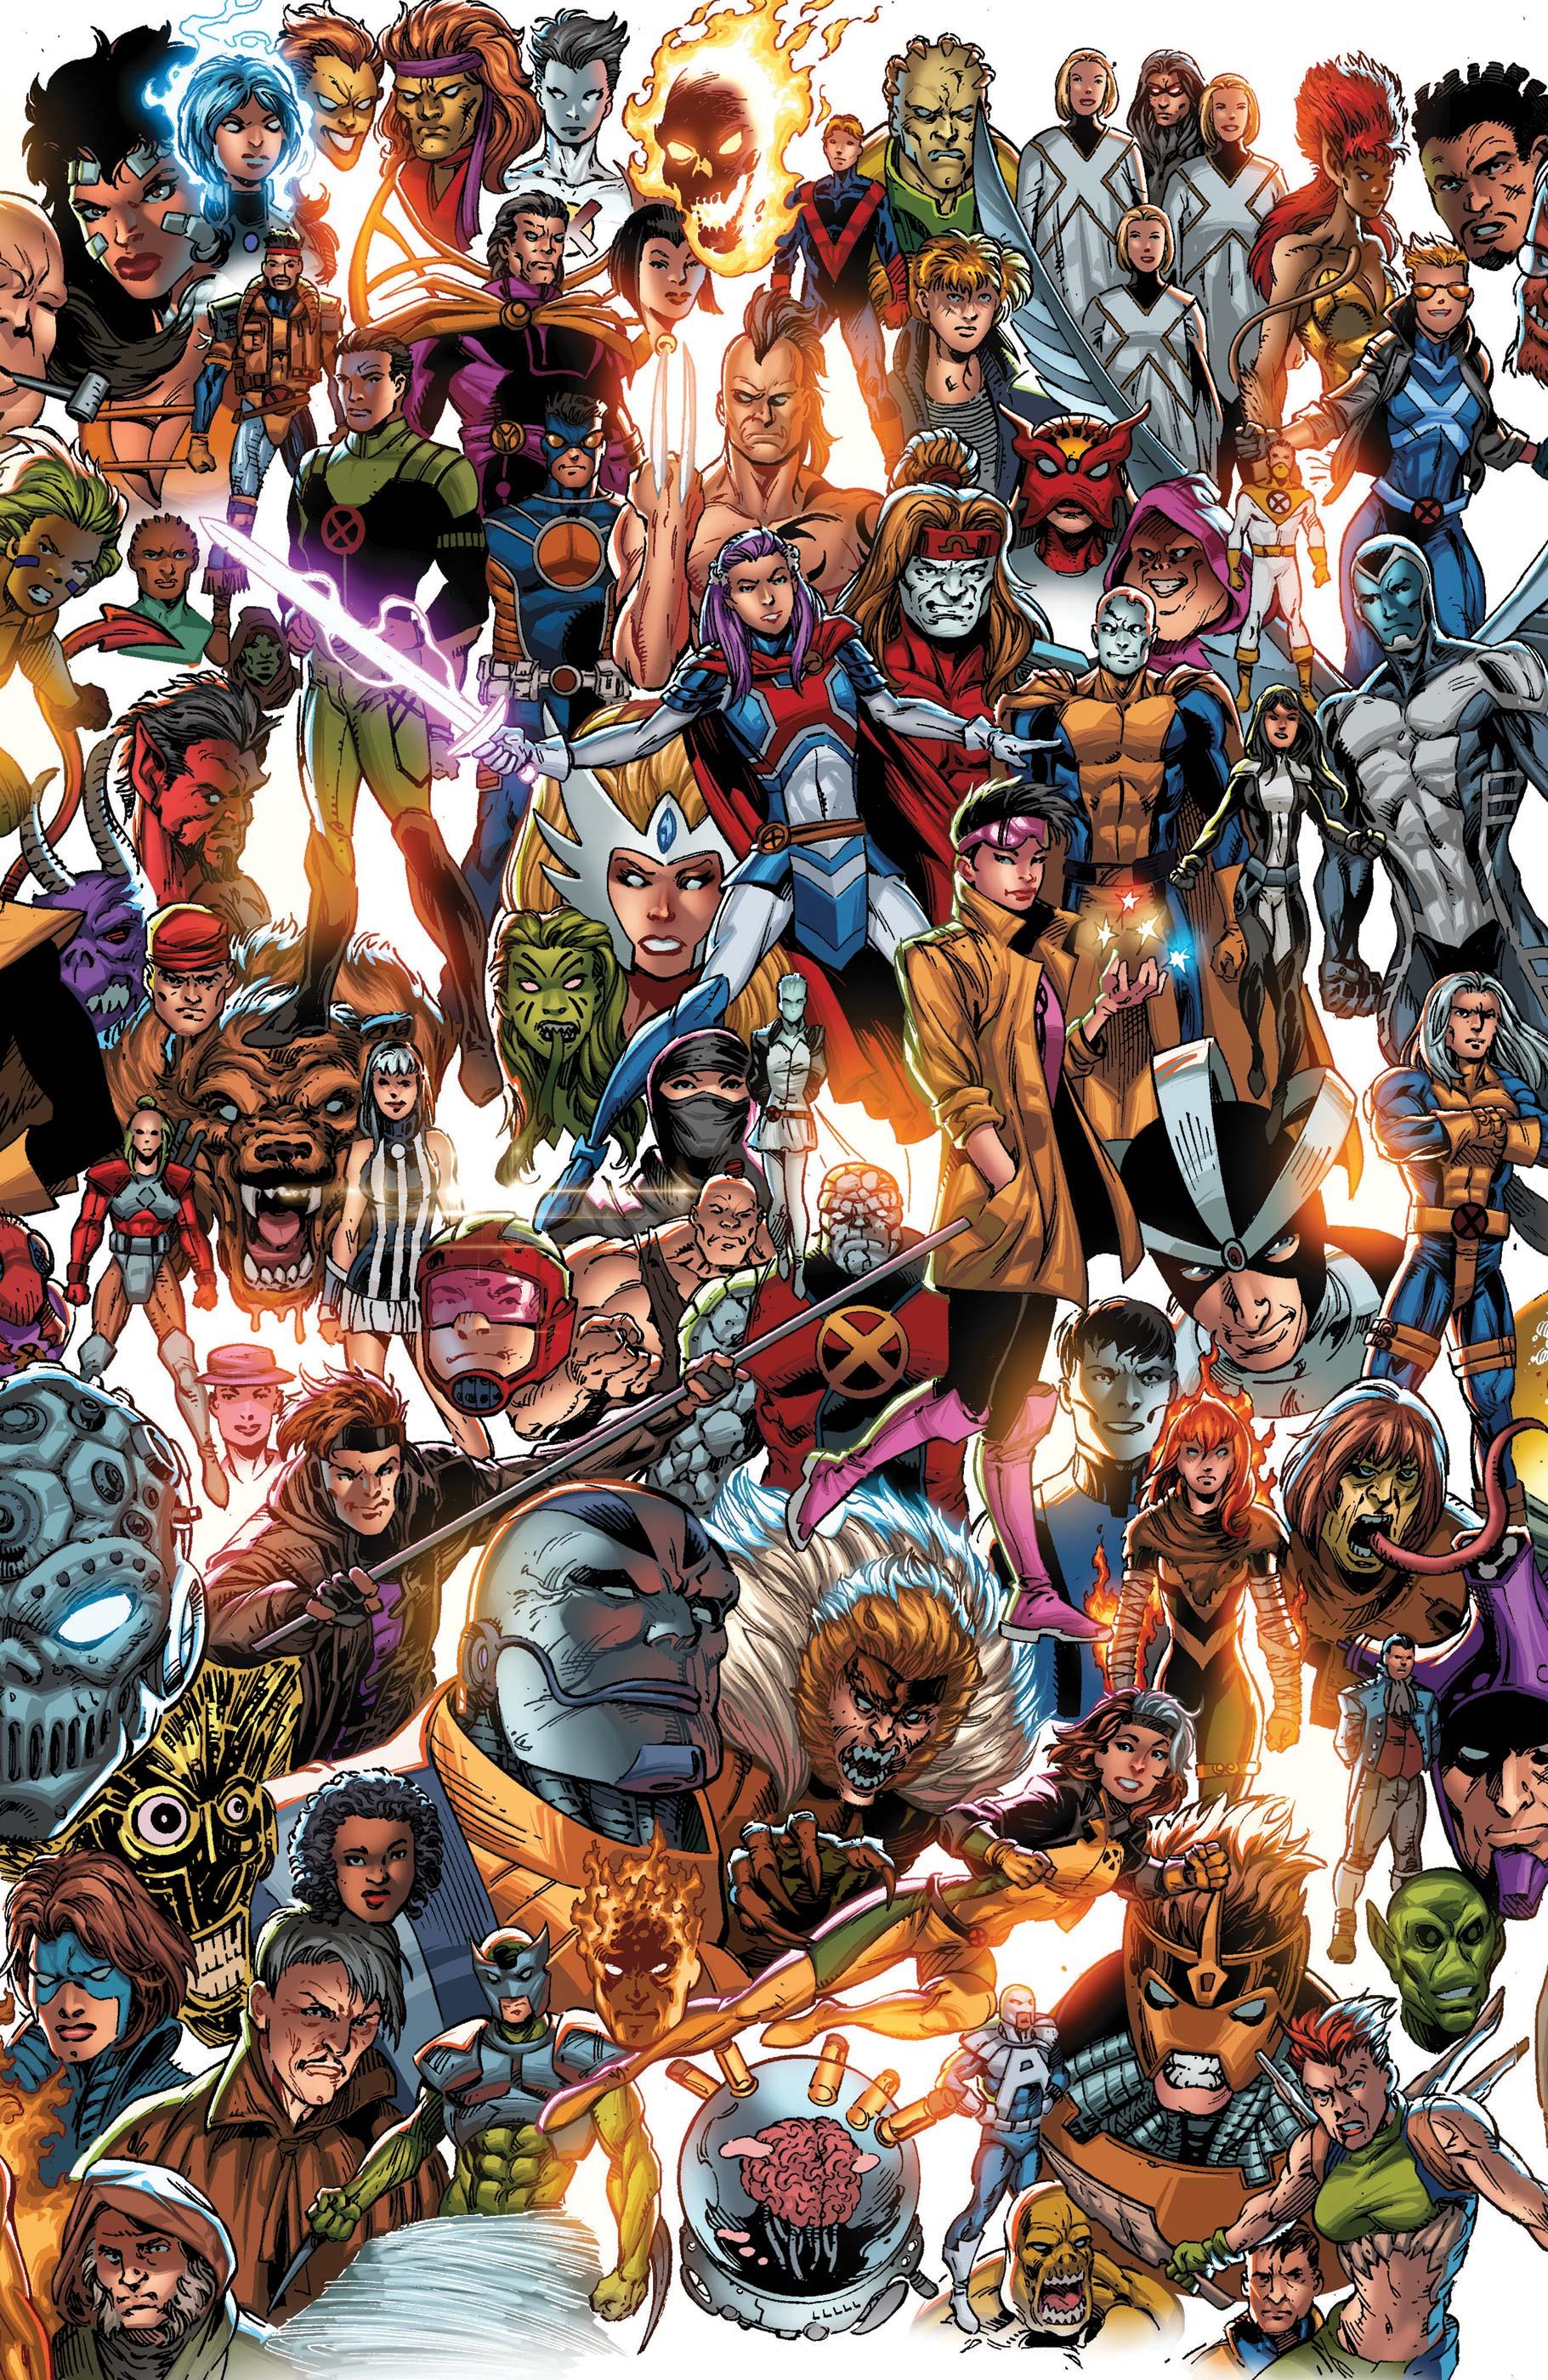 Excalibur Vol 4 1 Every Mutant Ever Variant.jpg